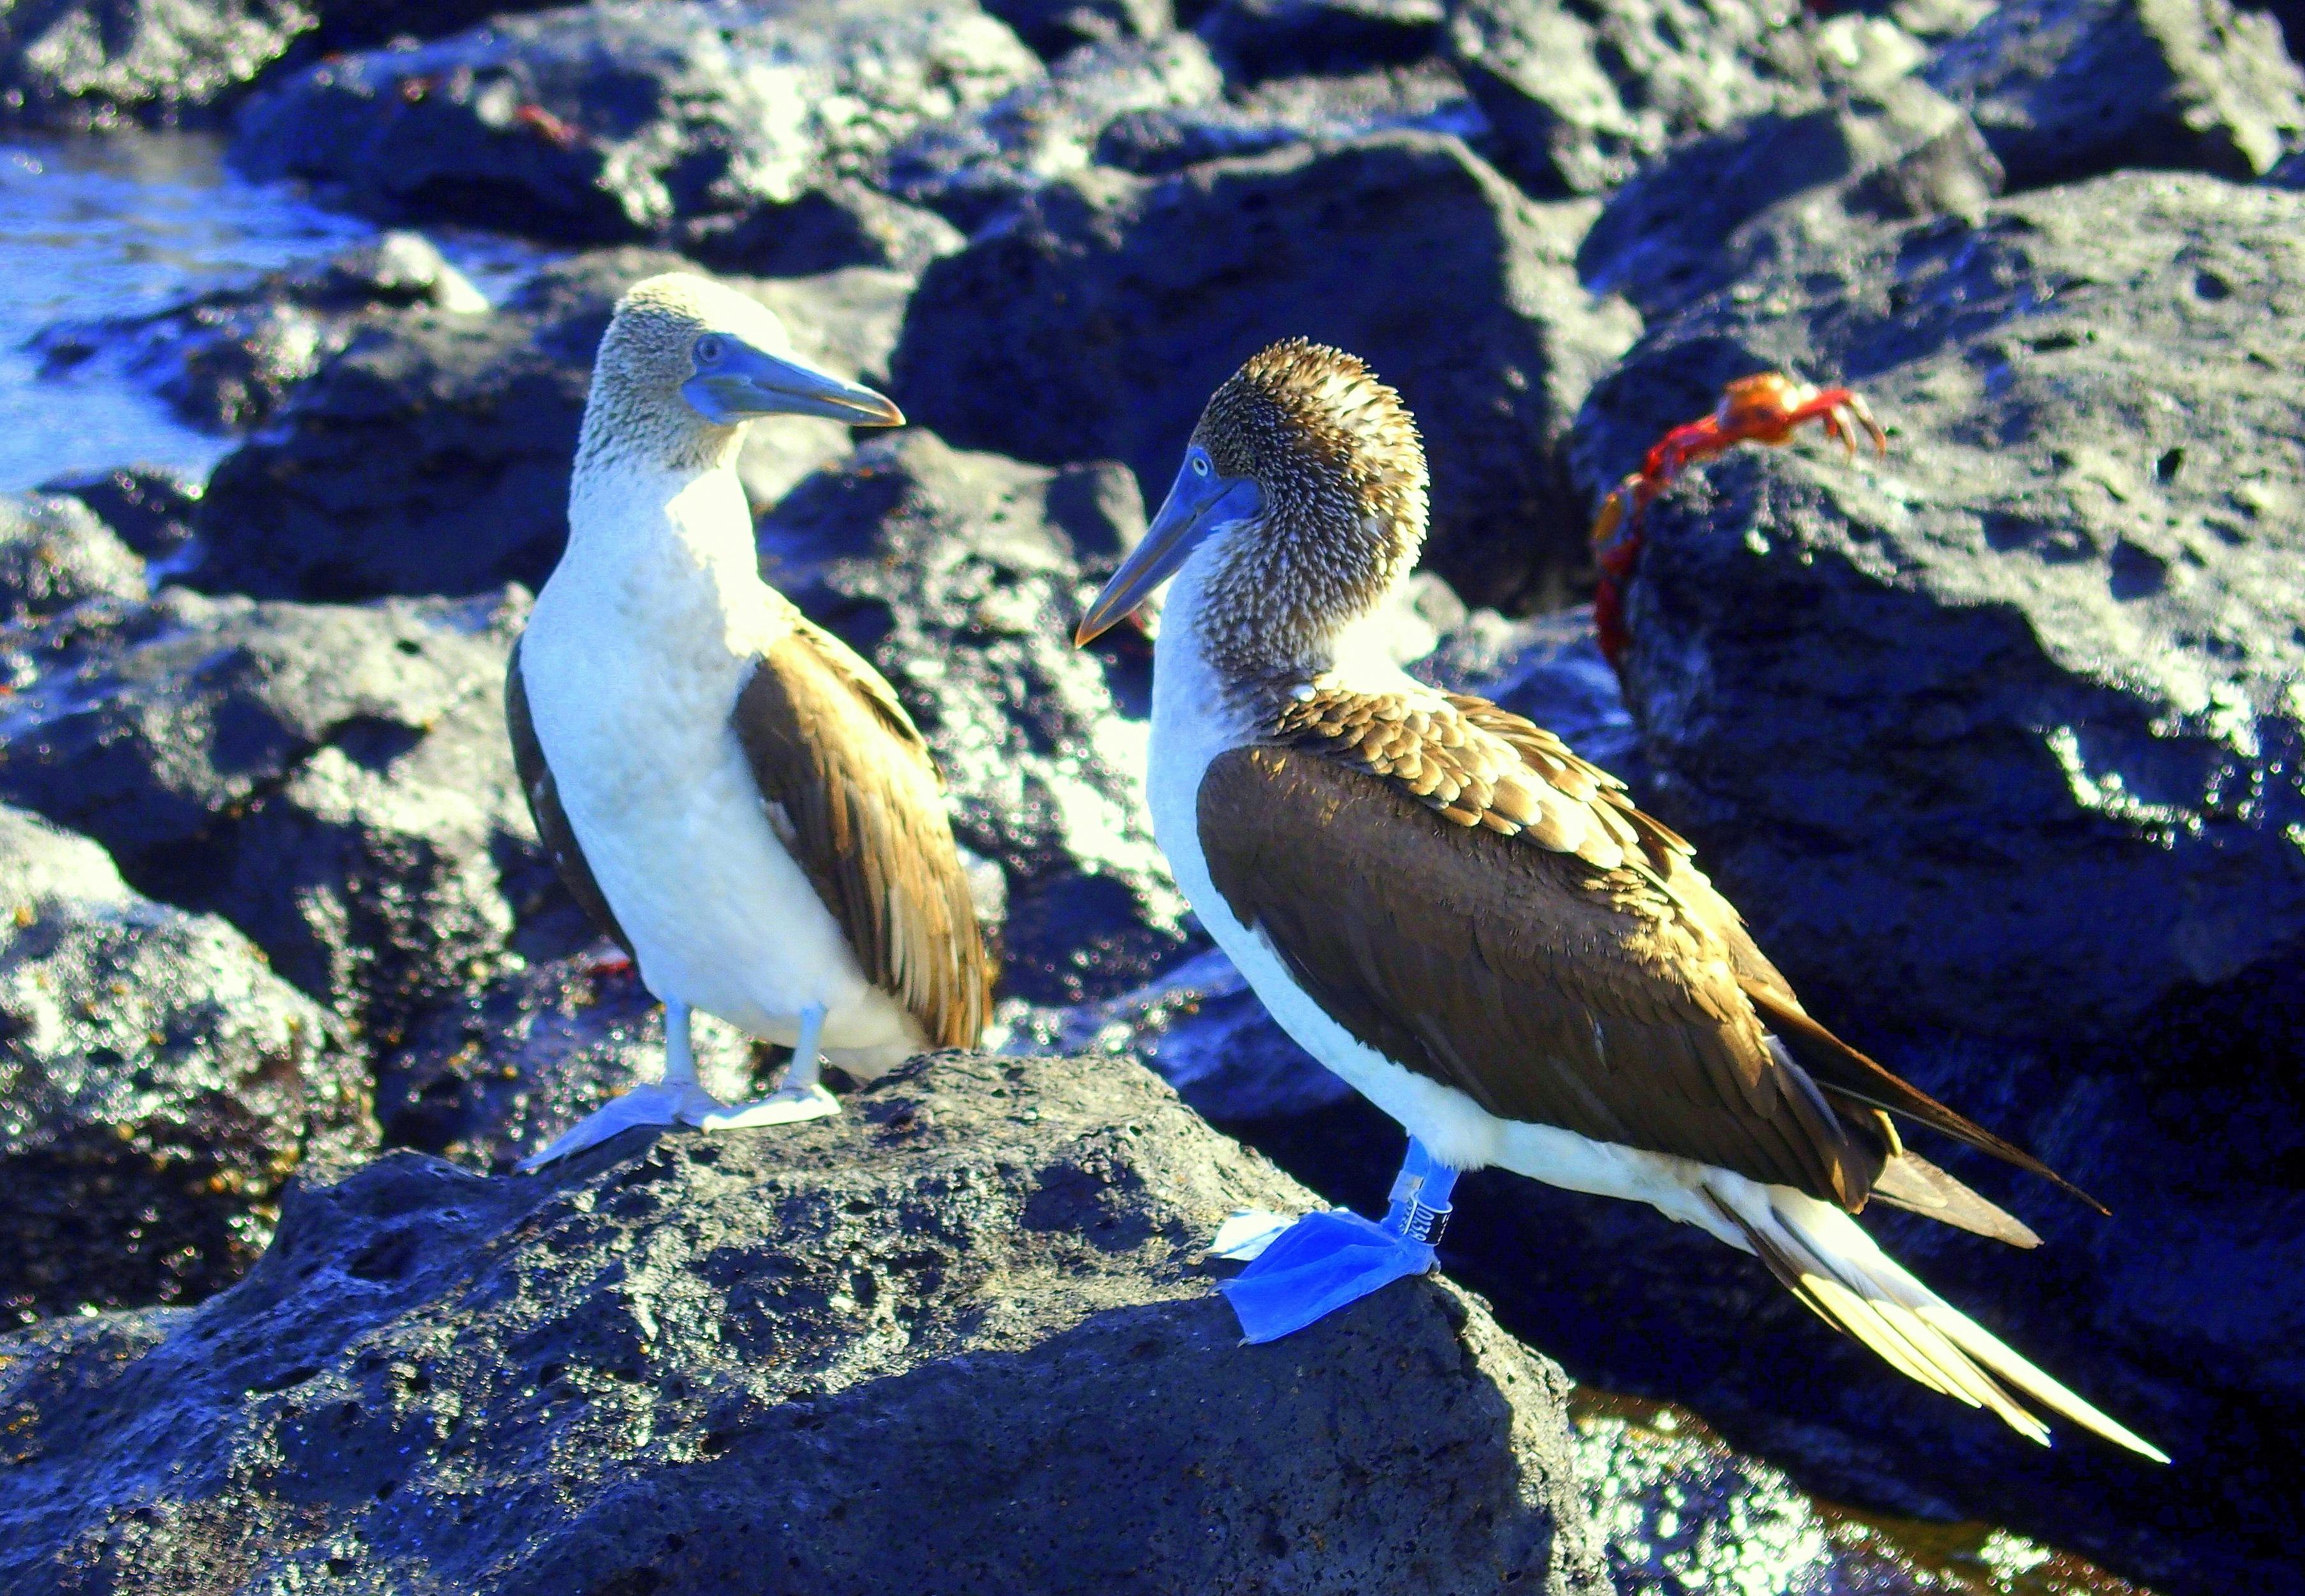 Fous à pattes bleues - Galapagos